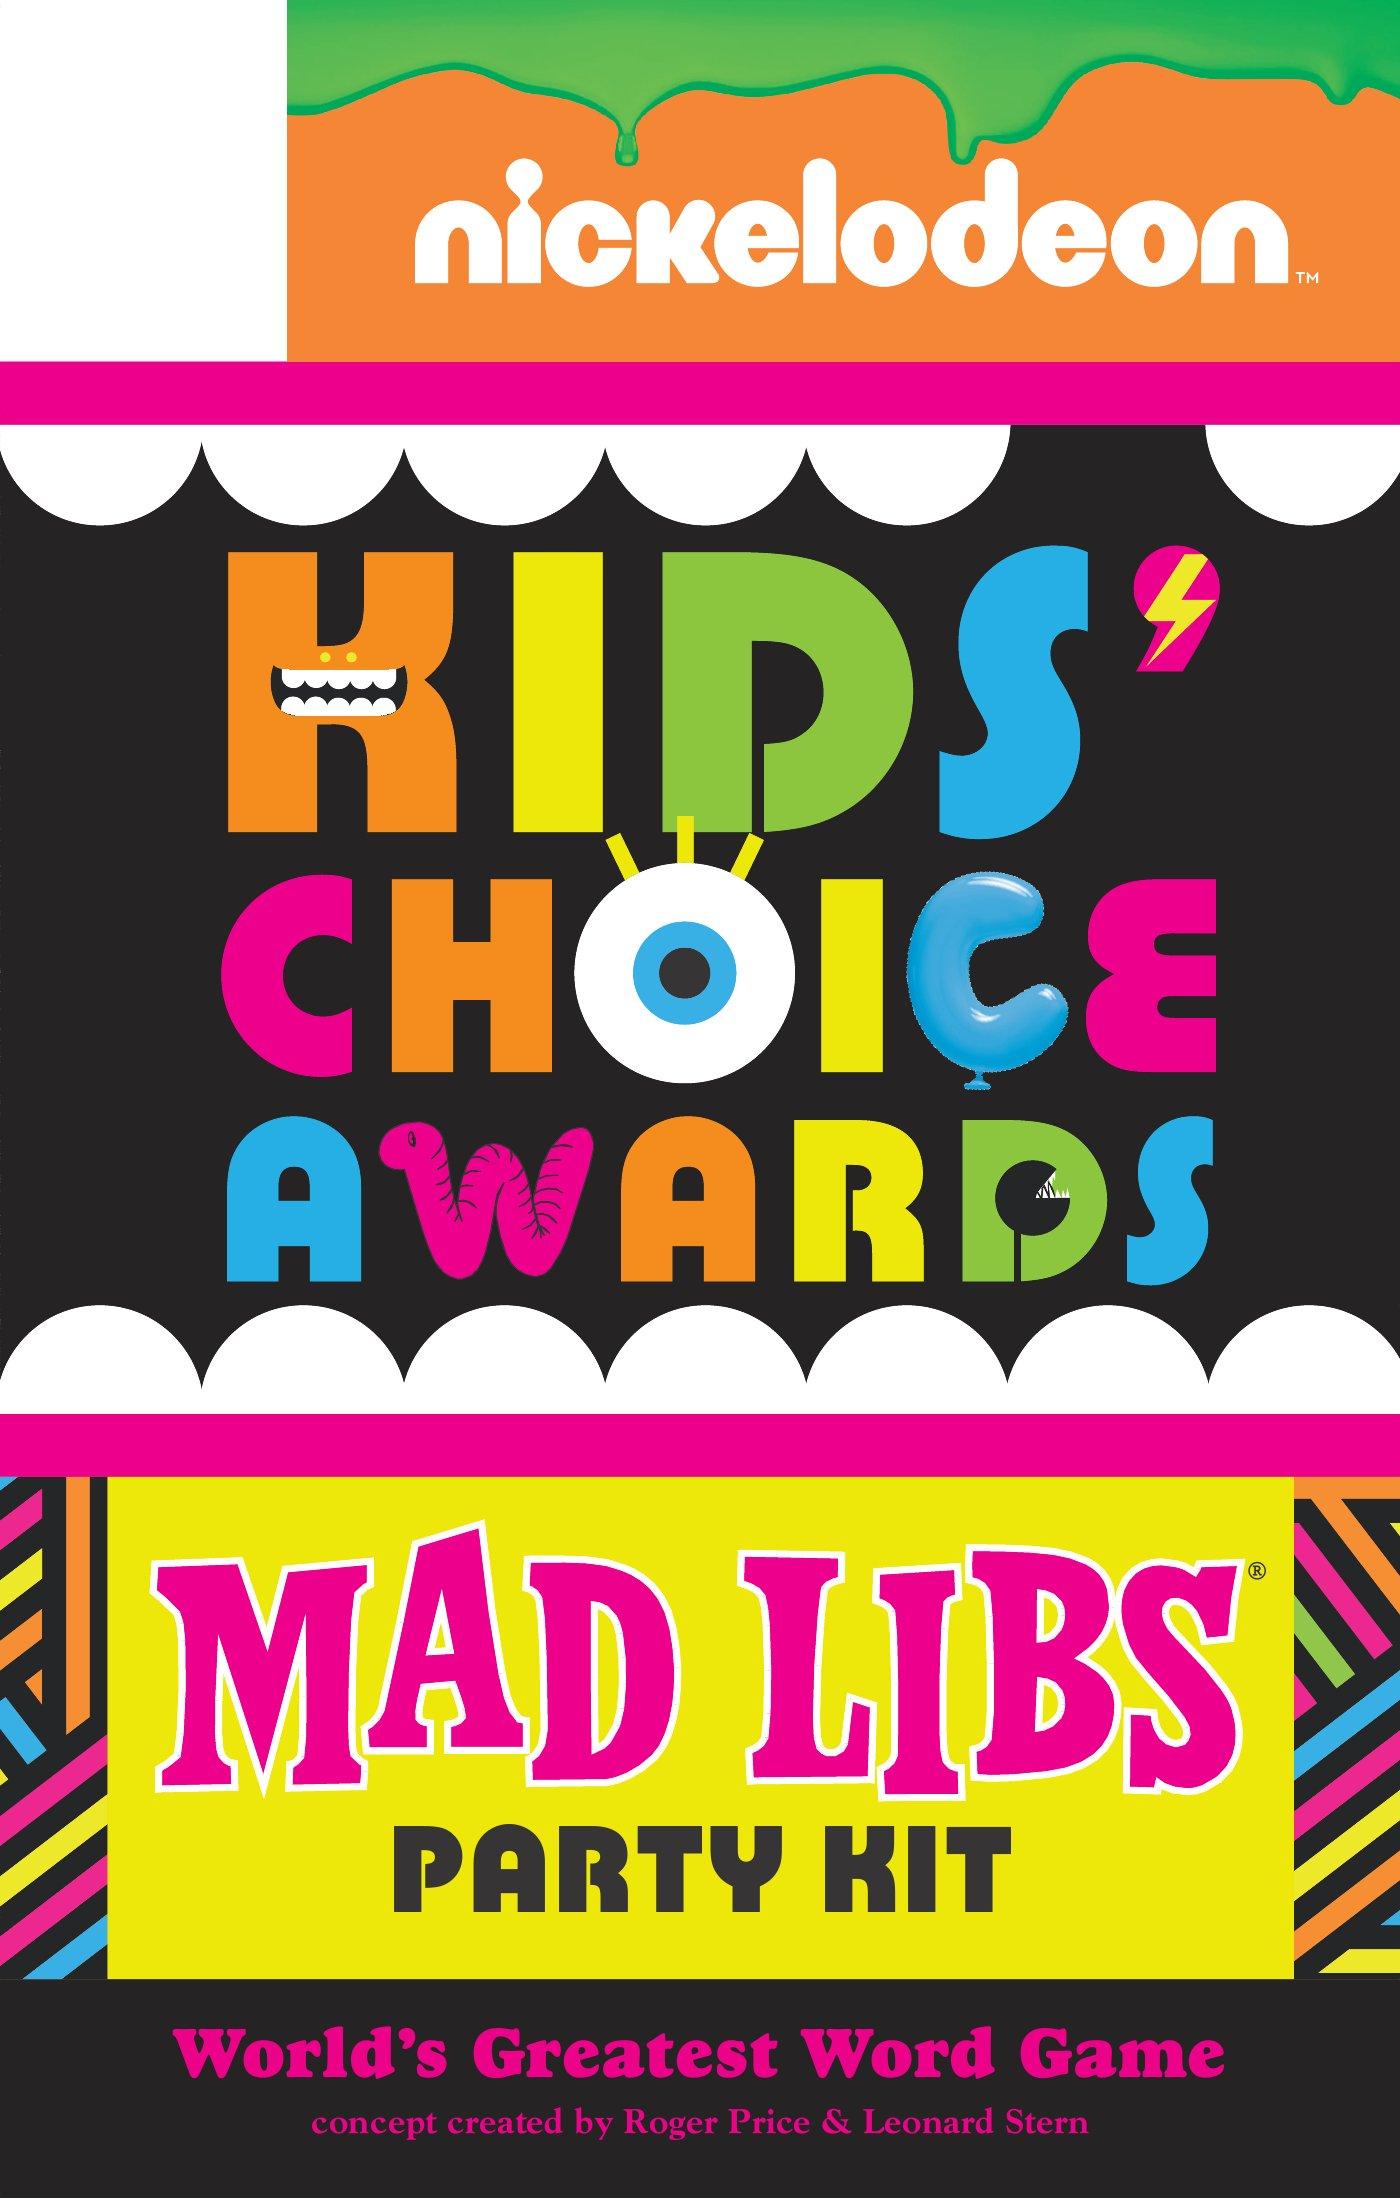 Nickelodeon Kids' Choice Awards Mad Libs Party Kit